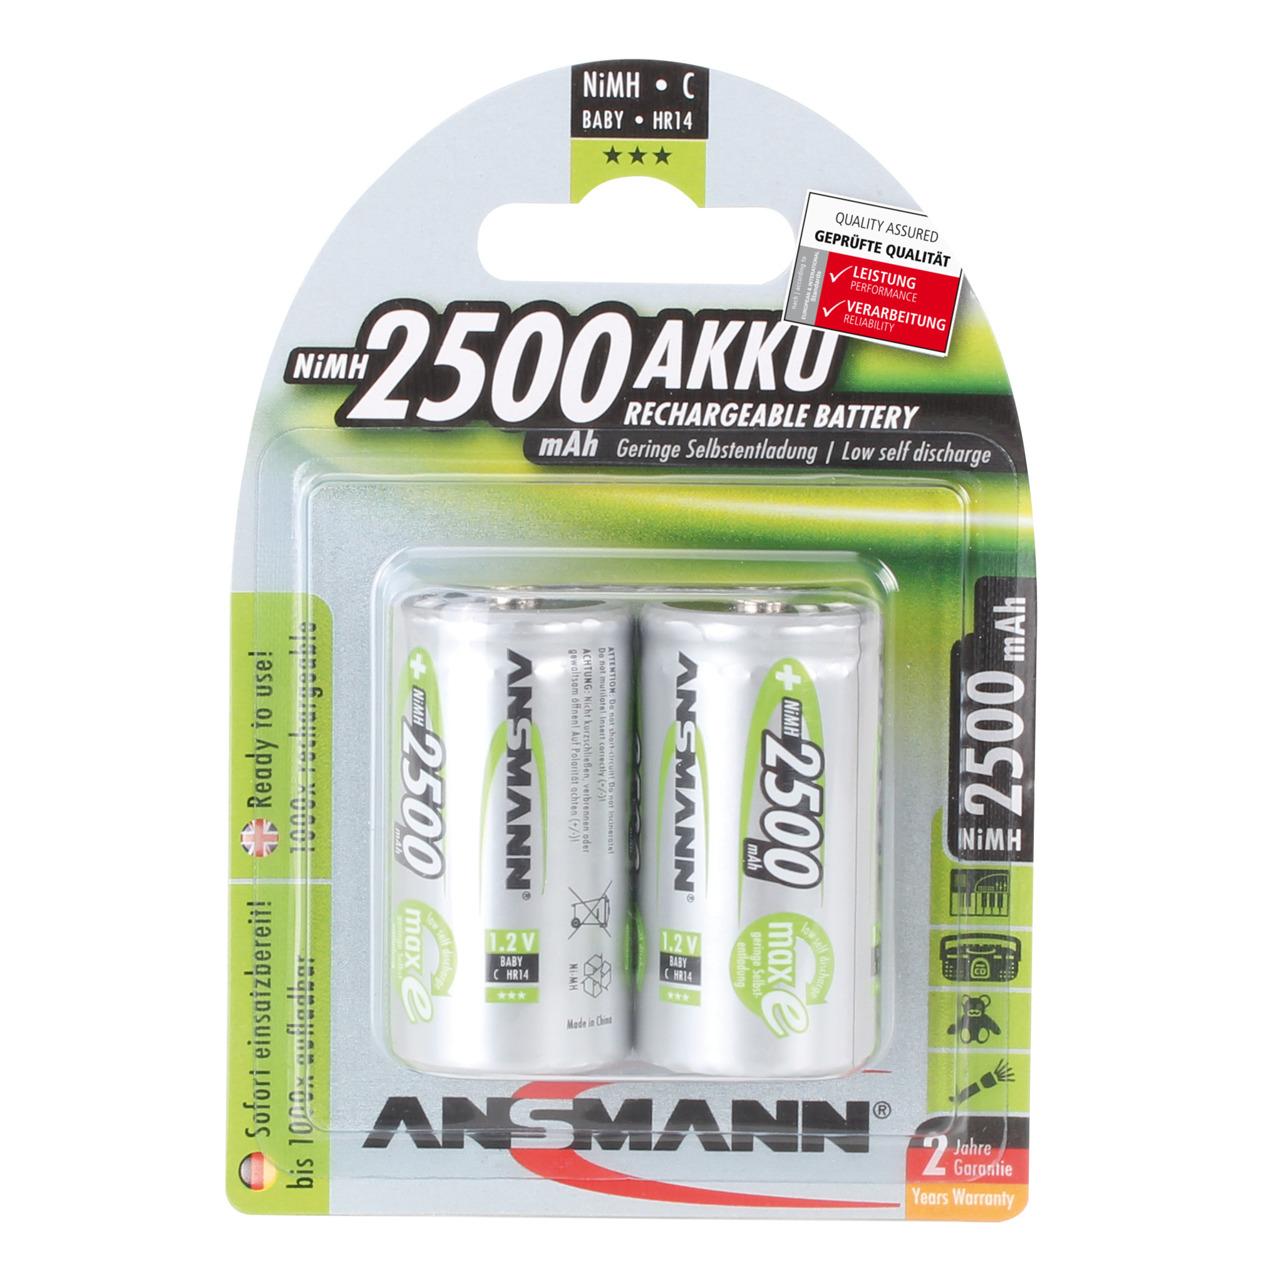 Ansmann NiMH Akku maxE- ready2use Baby C- 2500mAh- R14 2er Pack